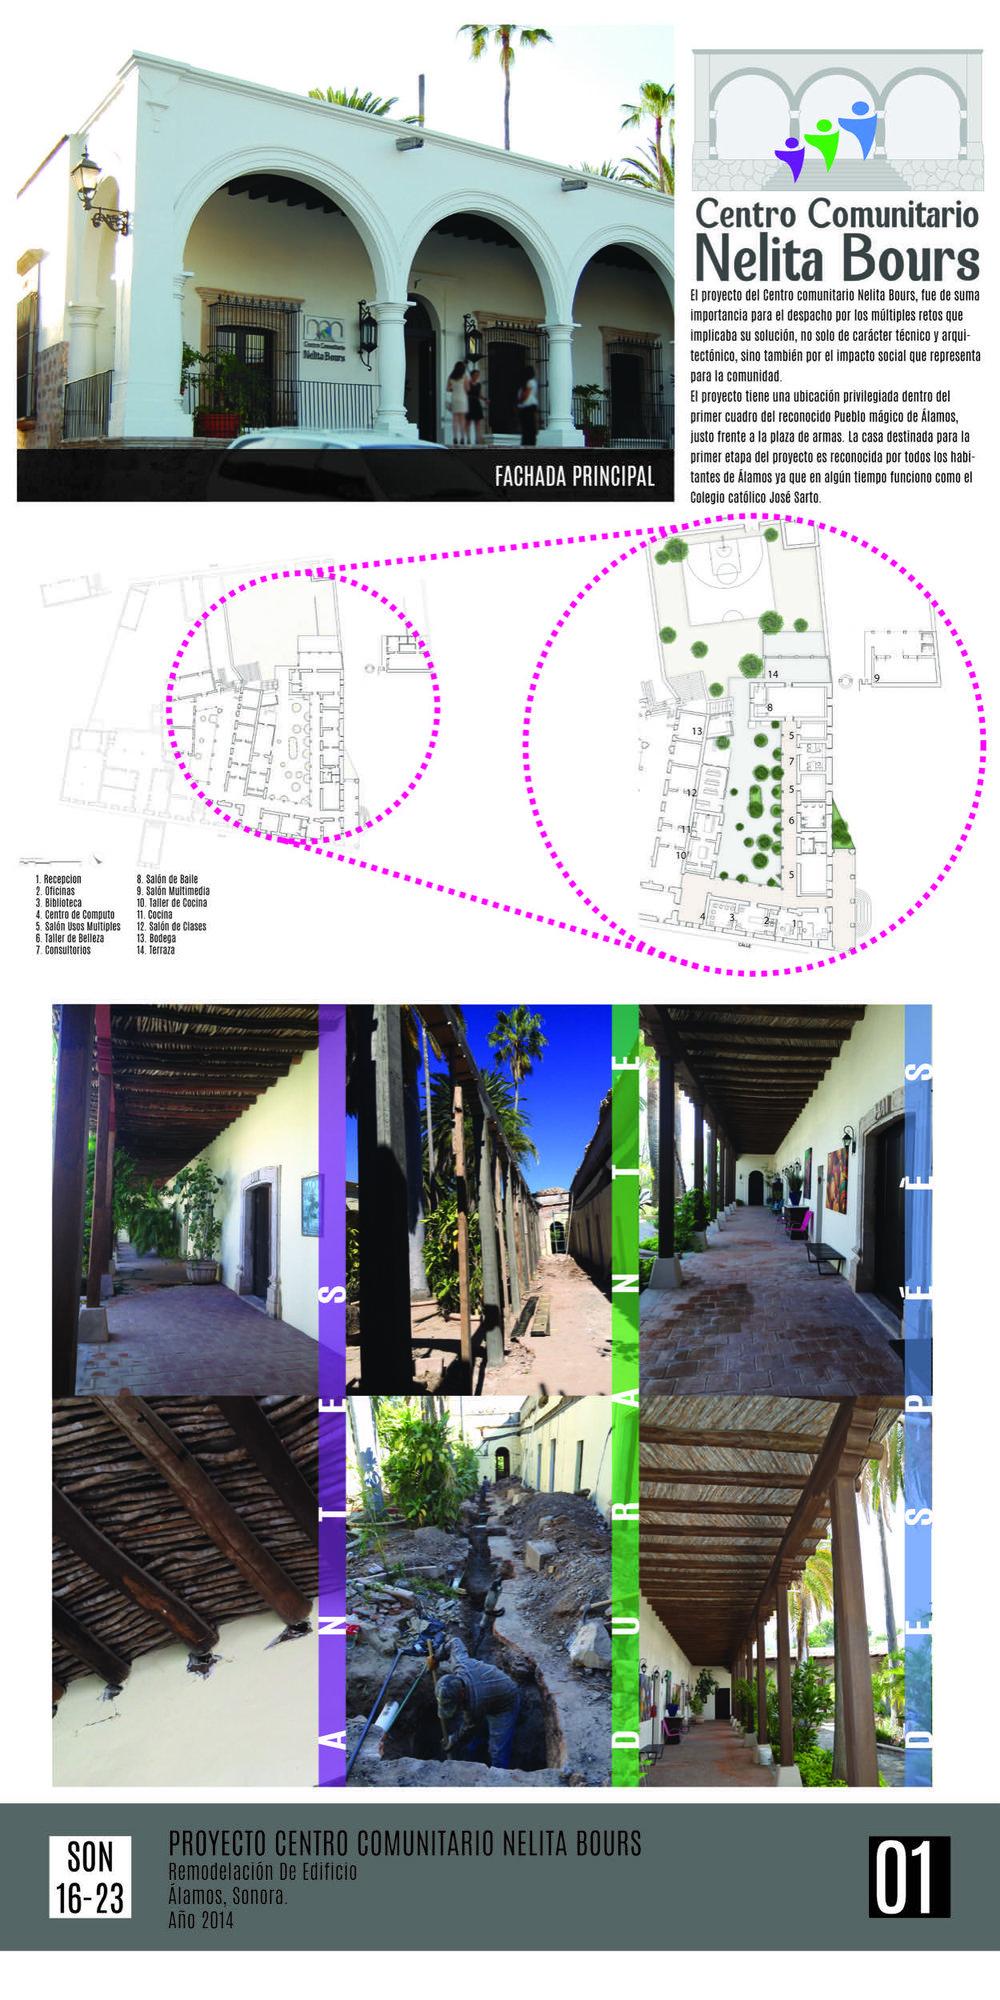 SON16-23-CENTROCOMUNITARIO-LAM1.jpg